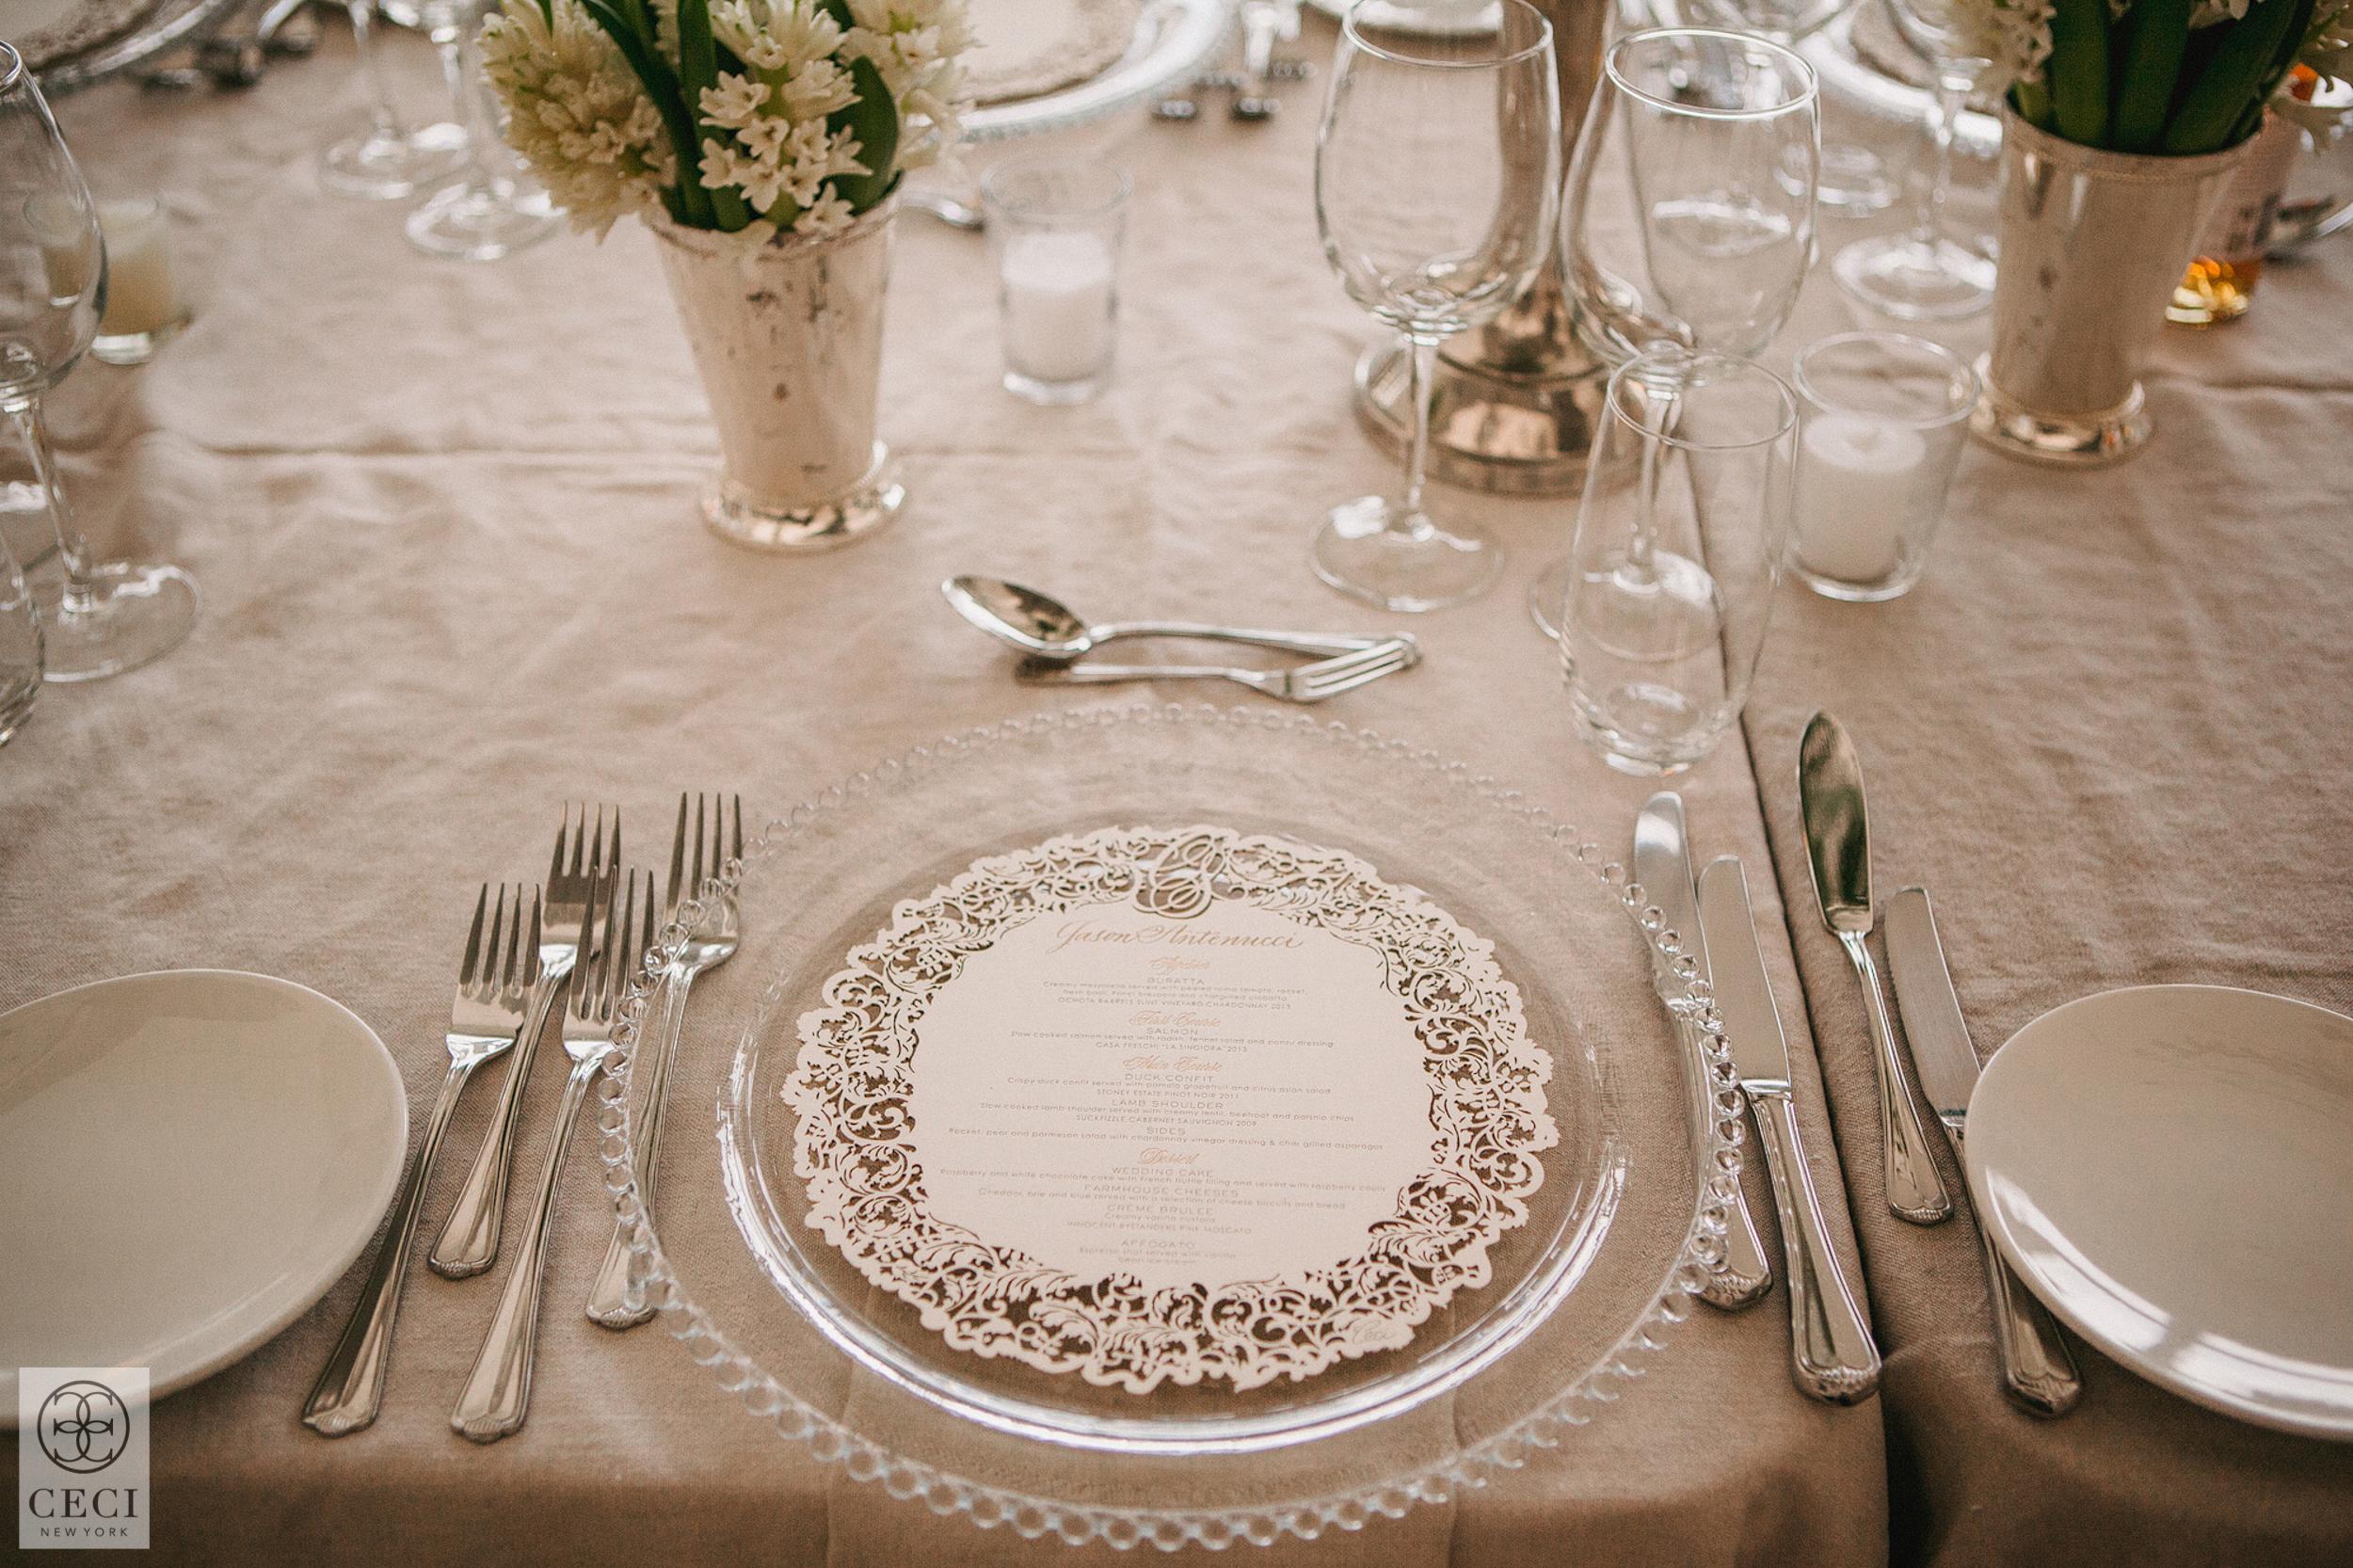 Ceci_New_York_Custom_Luxury_Wedding_BeautyShot_LaserCut_Stationery_Personalized_Couture_Foil_Stamping_Perth_Destination_Australia_Chic_-10.jpg